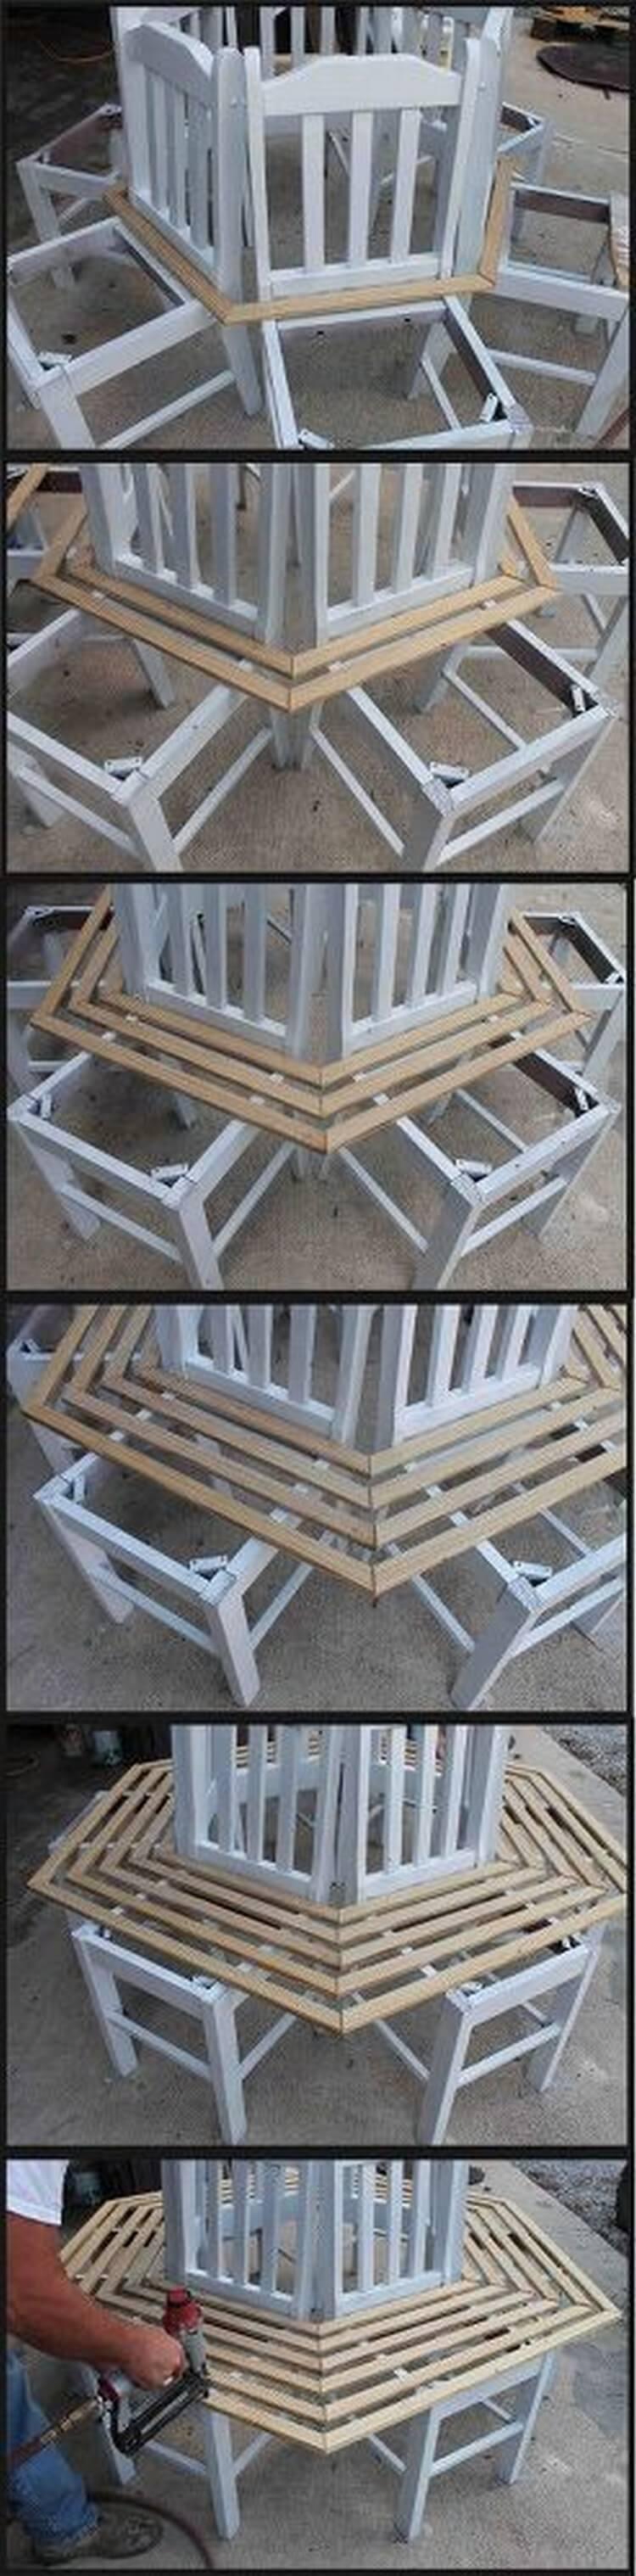 DIY Step bu Step Round Bench